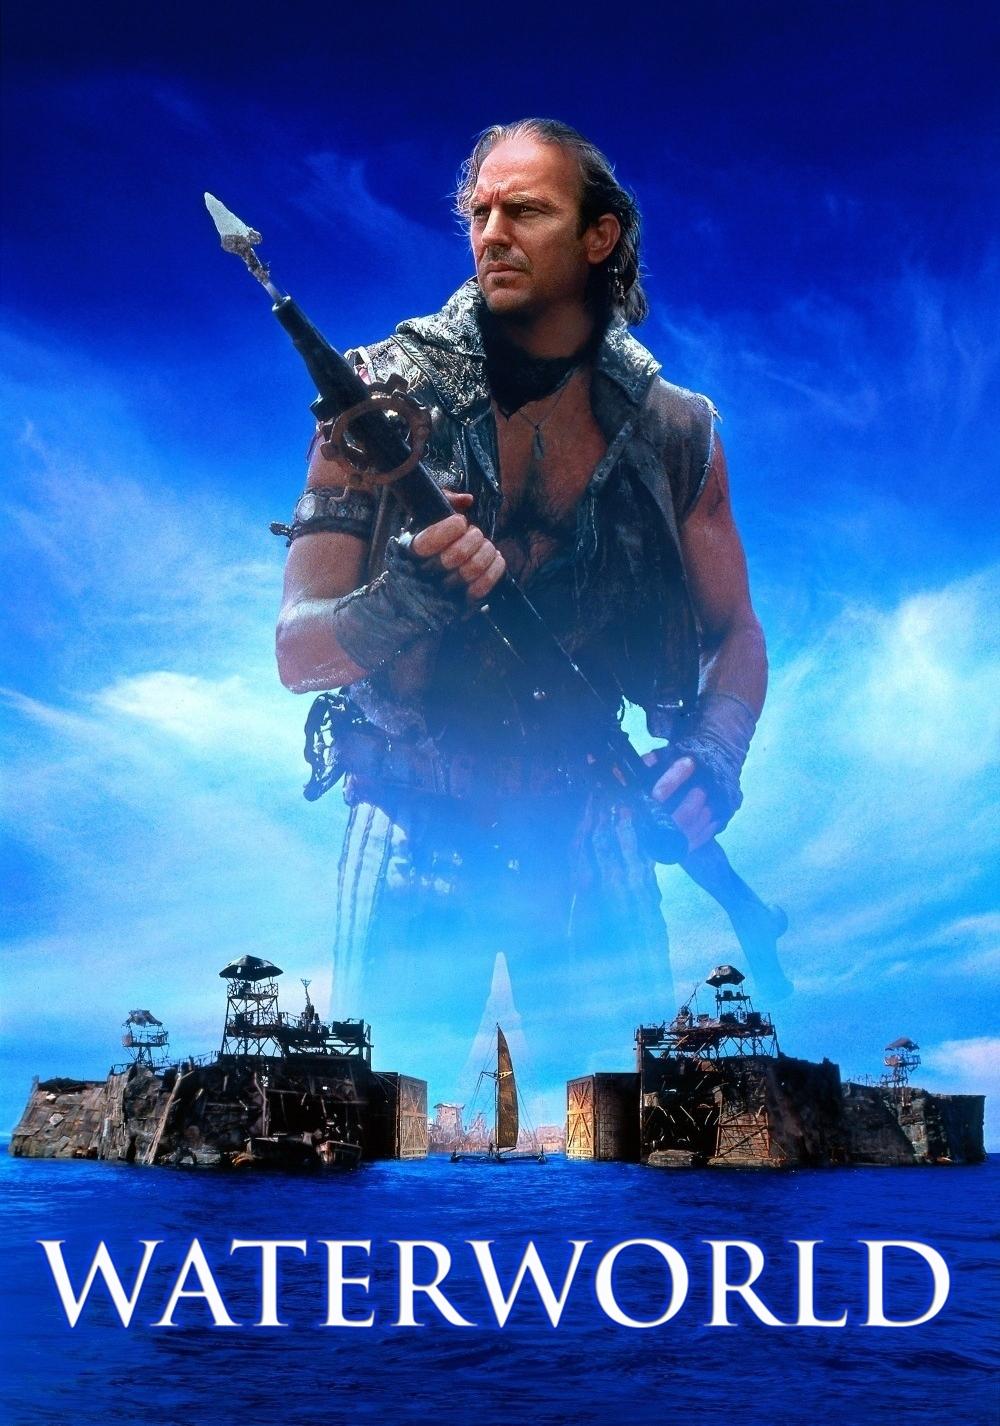 Waterworld Film